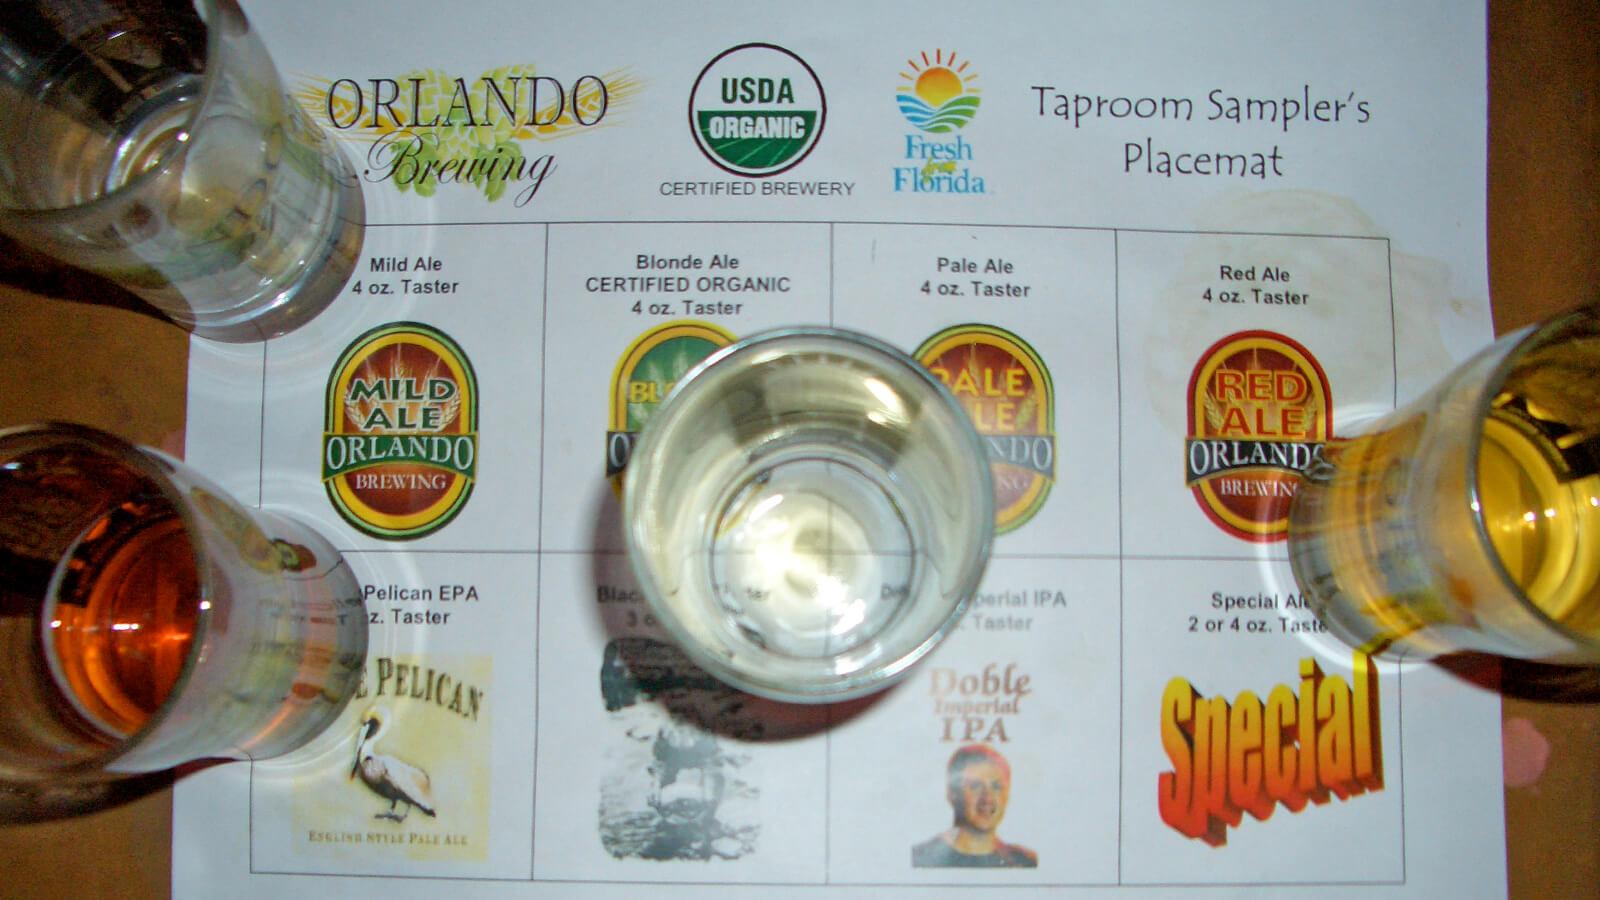 Sampling organic craft beers at Orlando Brewing in Florida